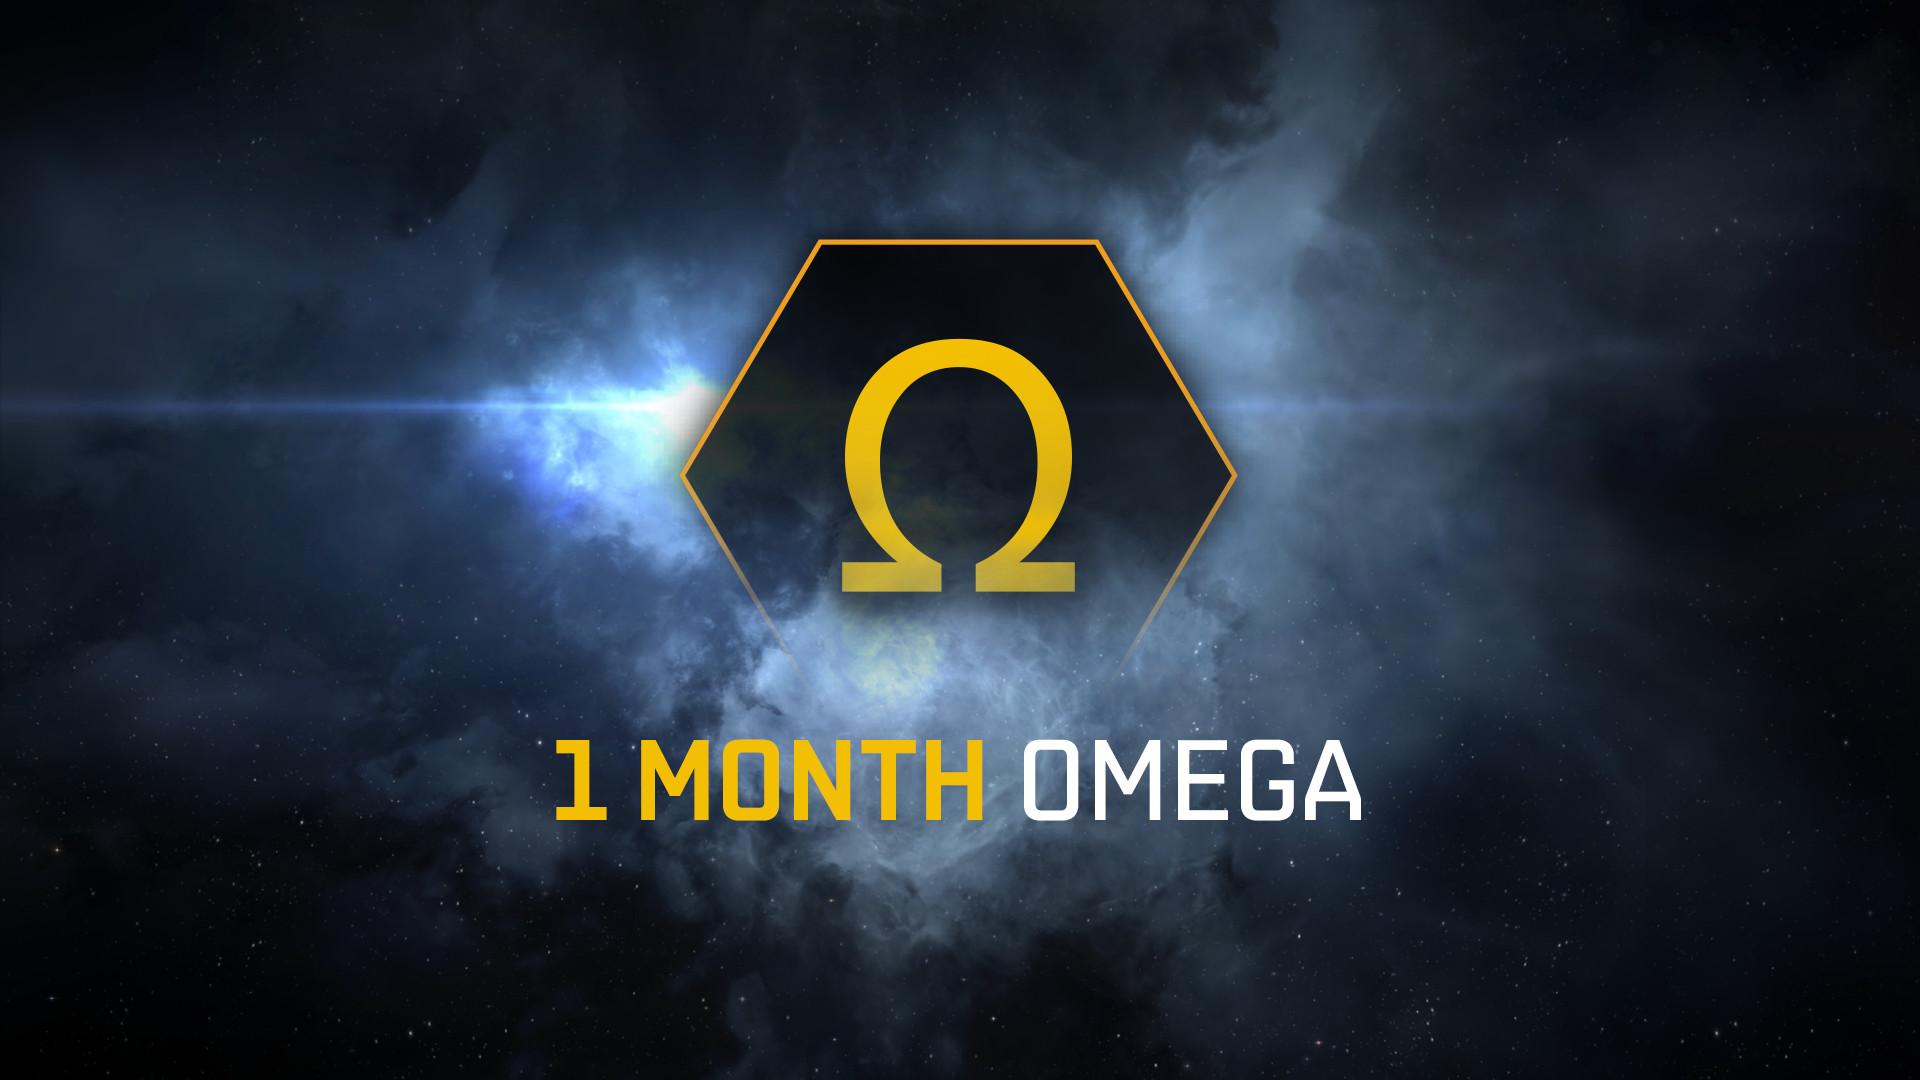 EVE Online: 1 Month Omega Time